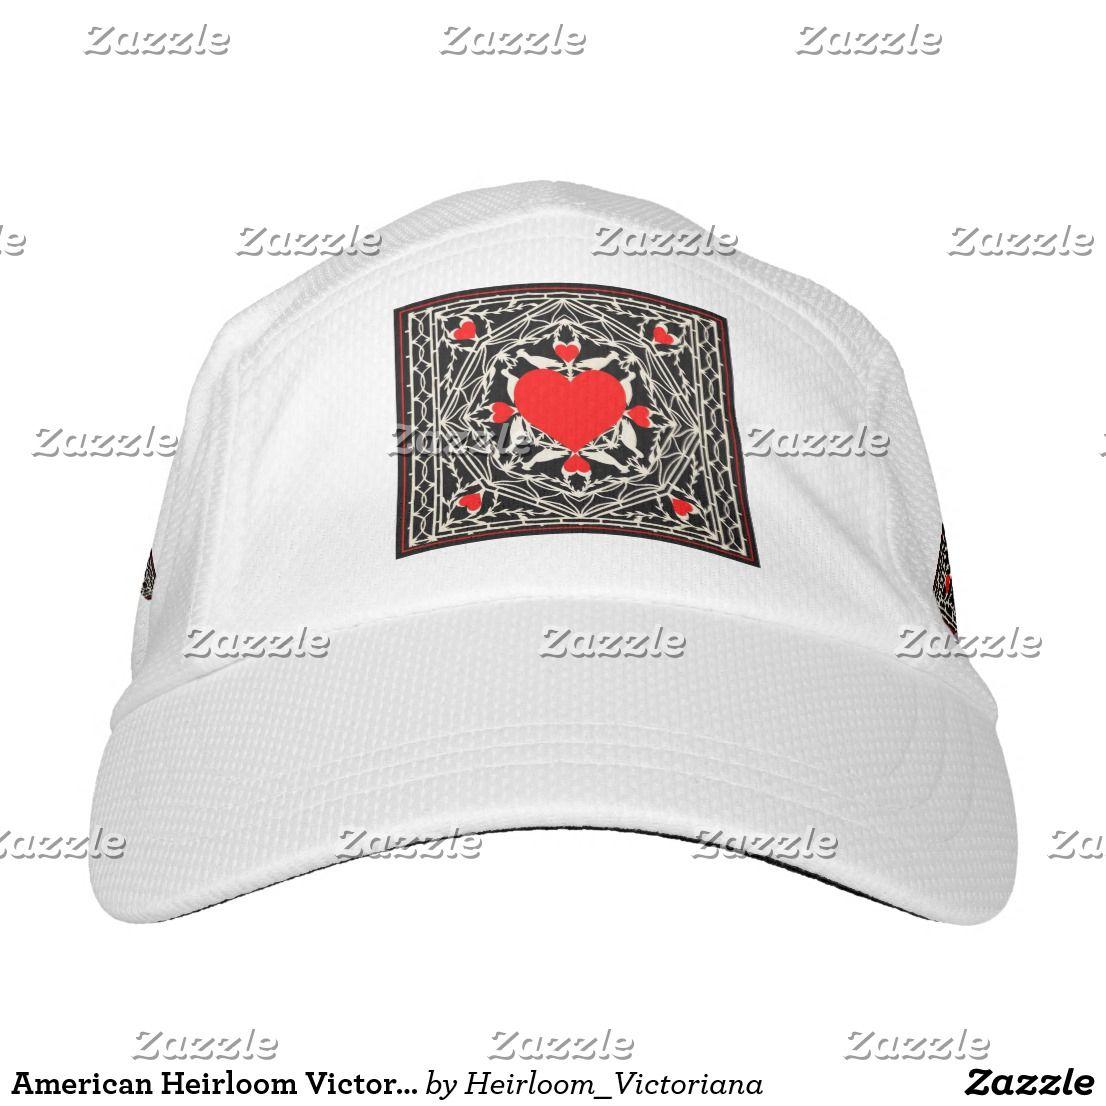 American heirloom victorian hearts and love birds headsweats hat